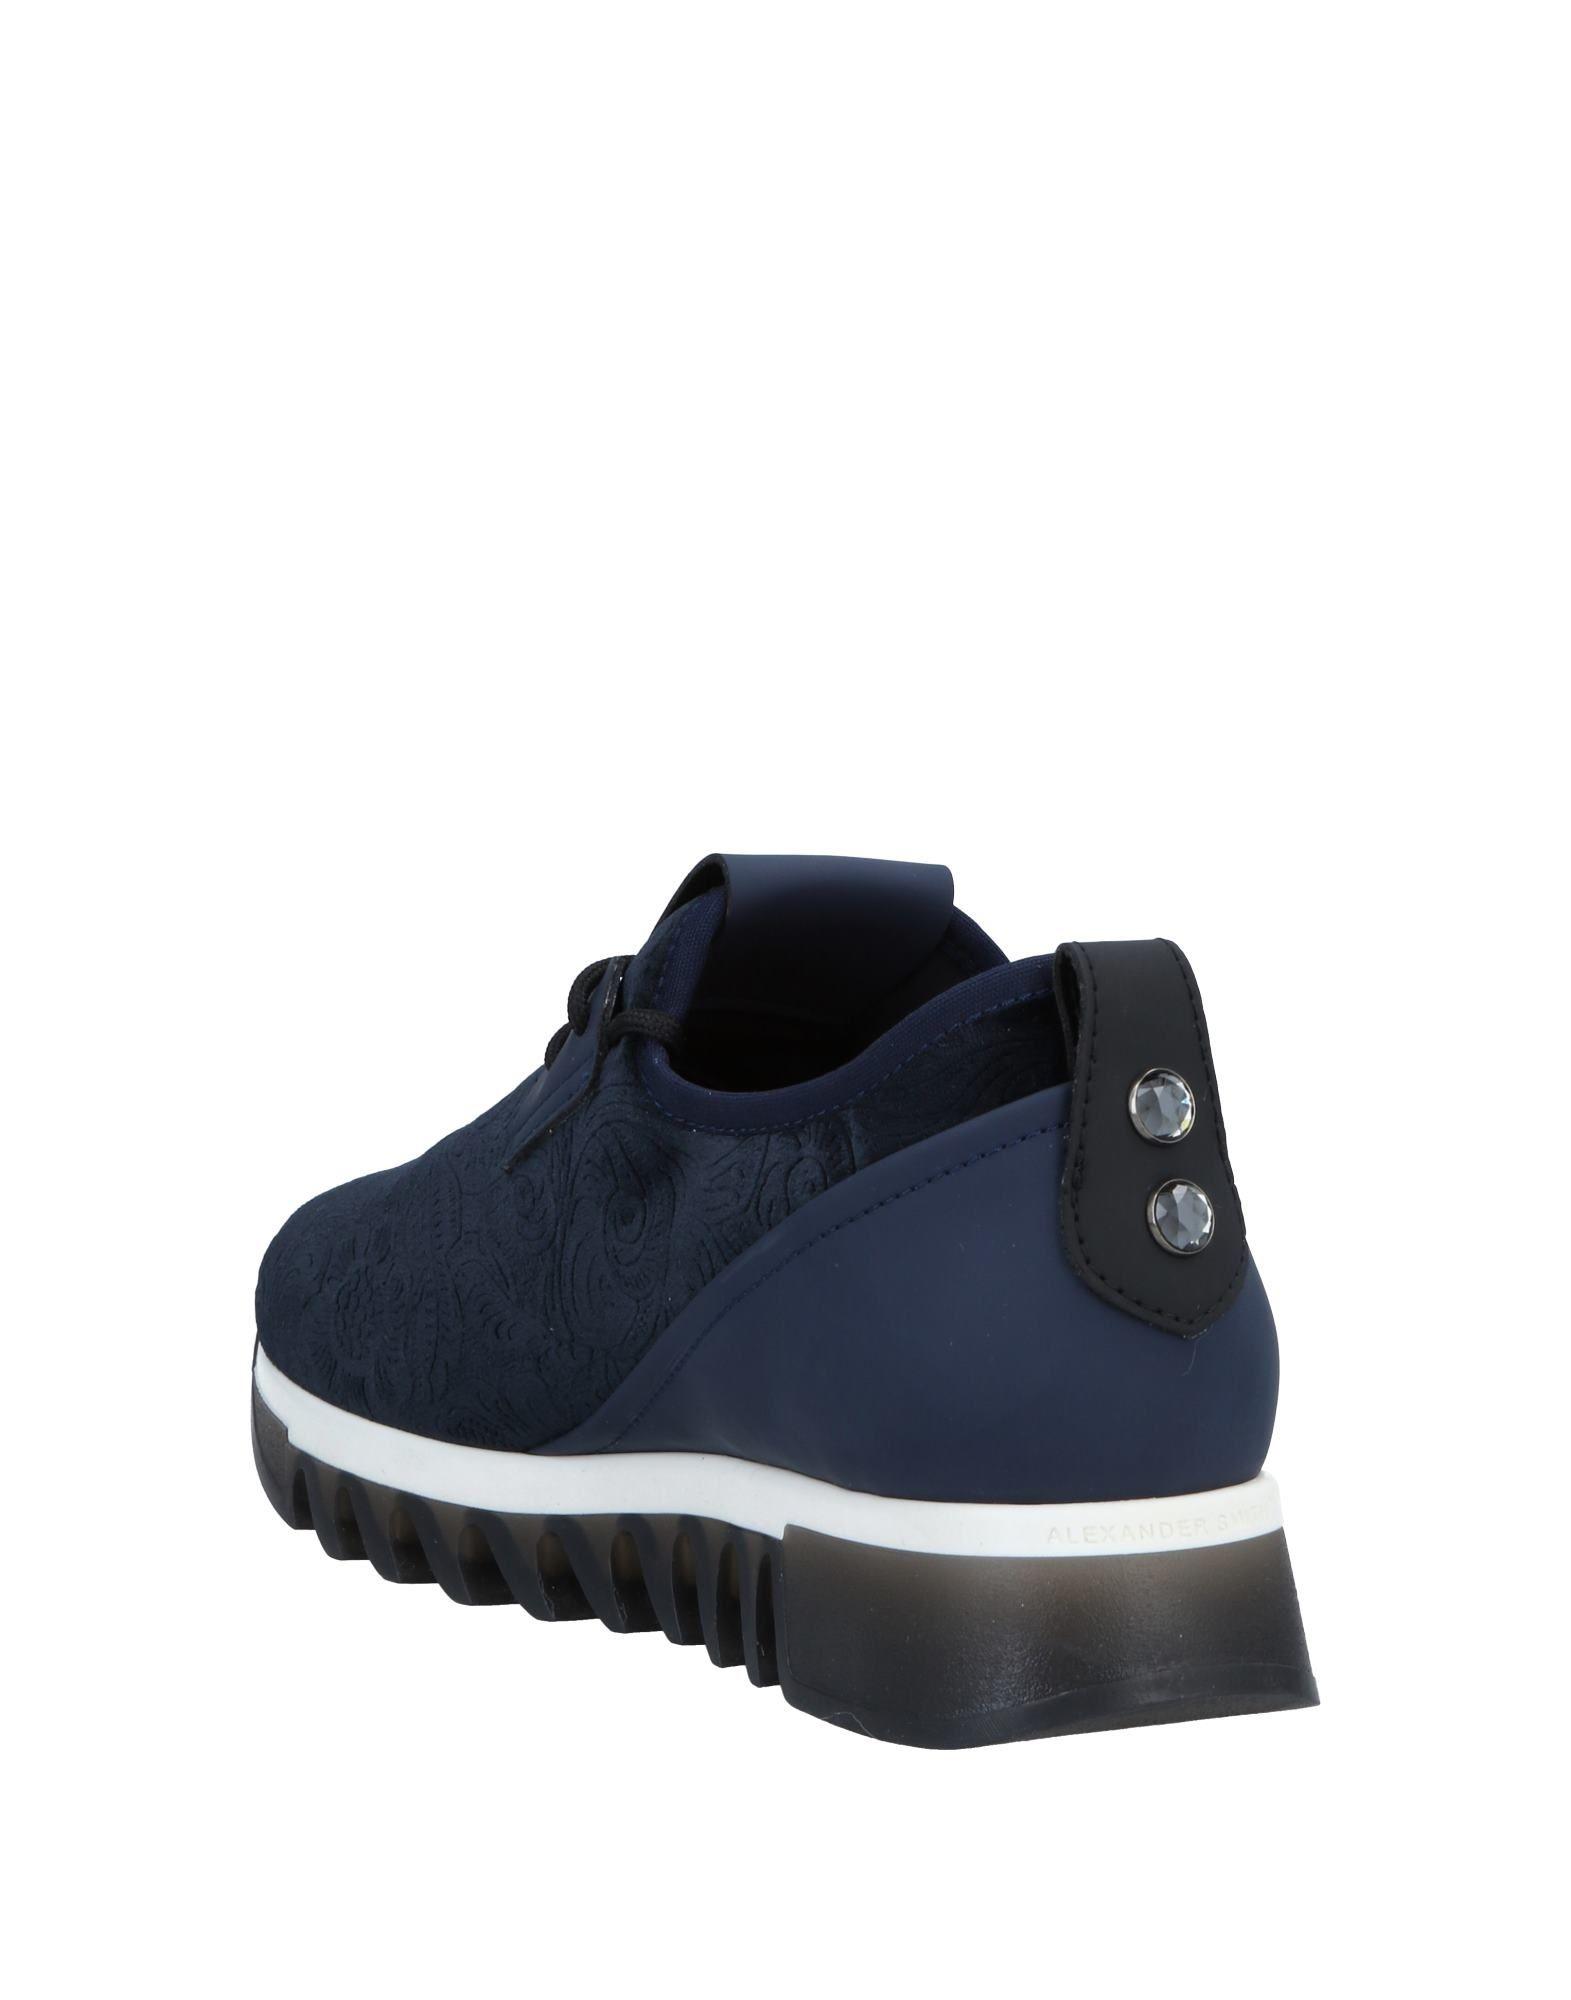 Stilvolle billige Schuhe Alexander  Smith Sneakers Damen  Alexander 11567471EQ 2443a3